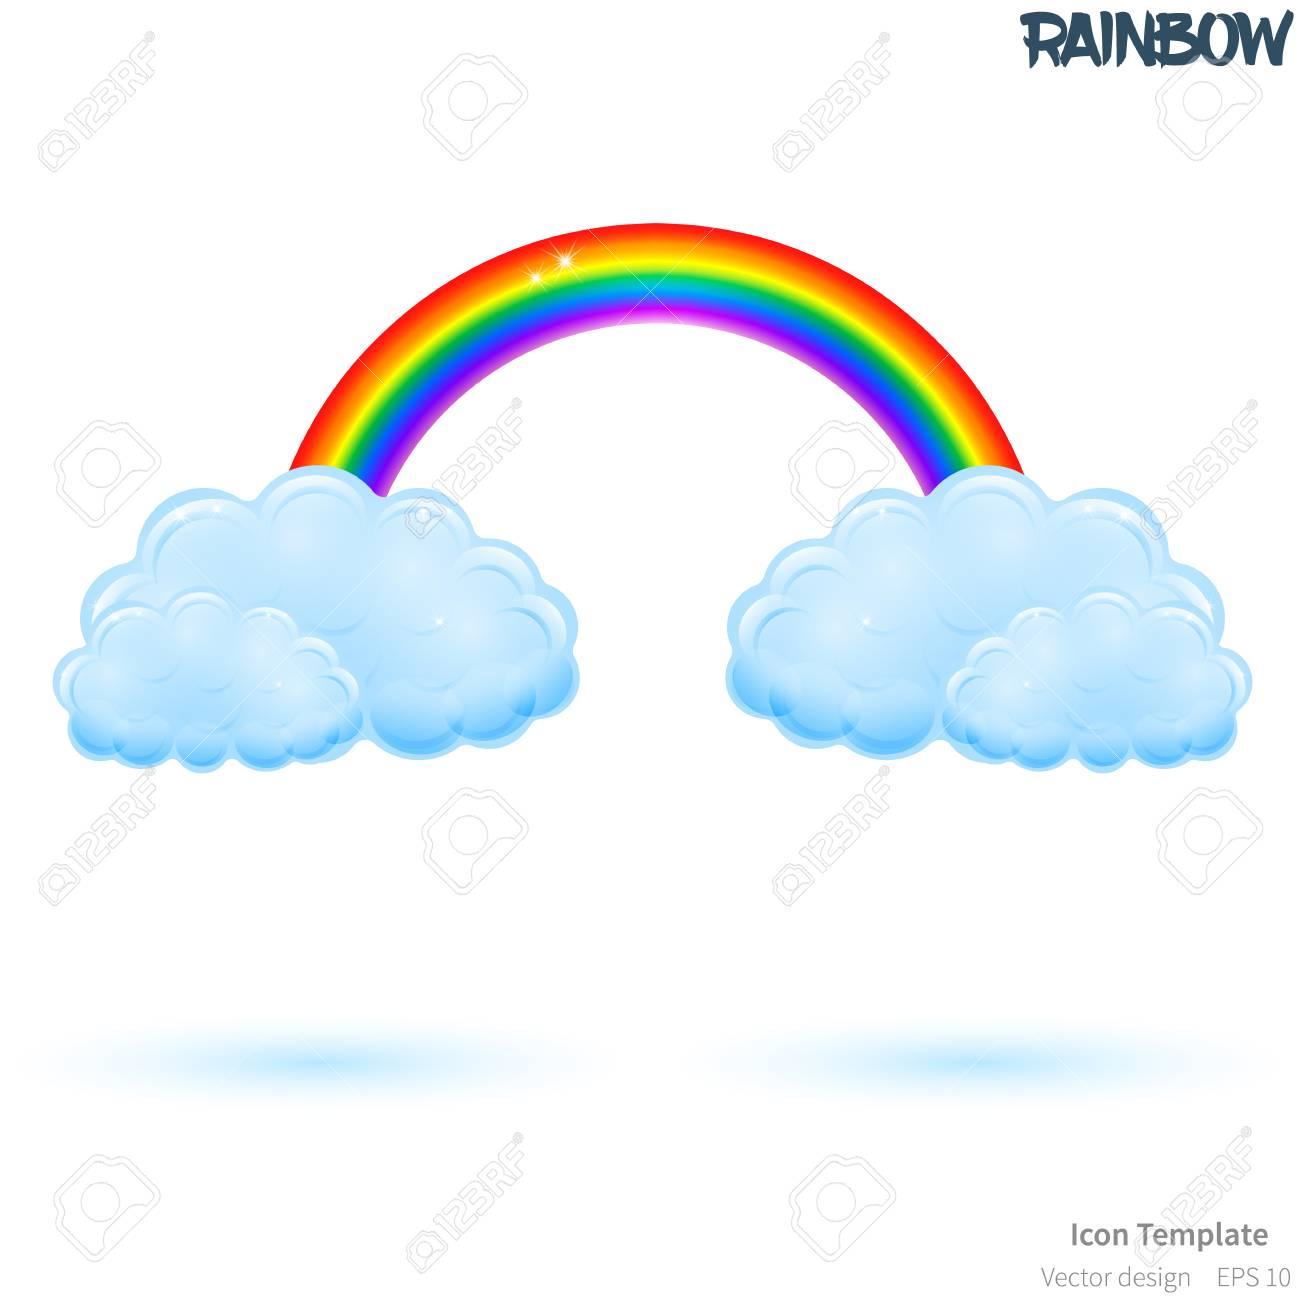 Rainbow Template | Fully Vector Rainbow Icon Template Glossy Blue Cloud Object